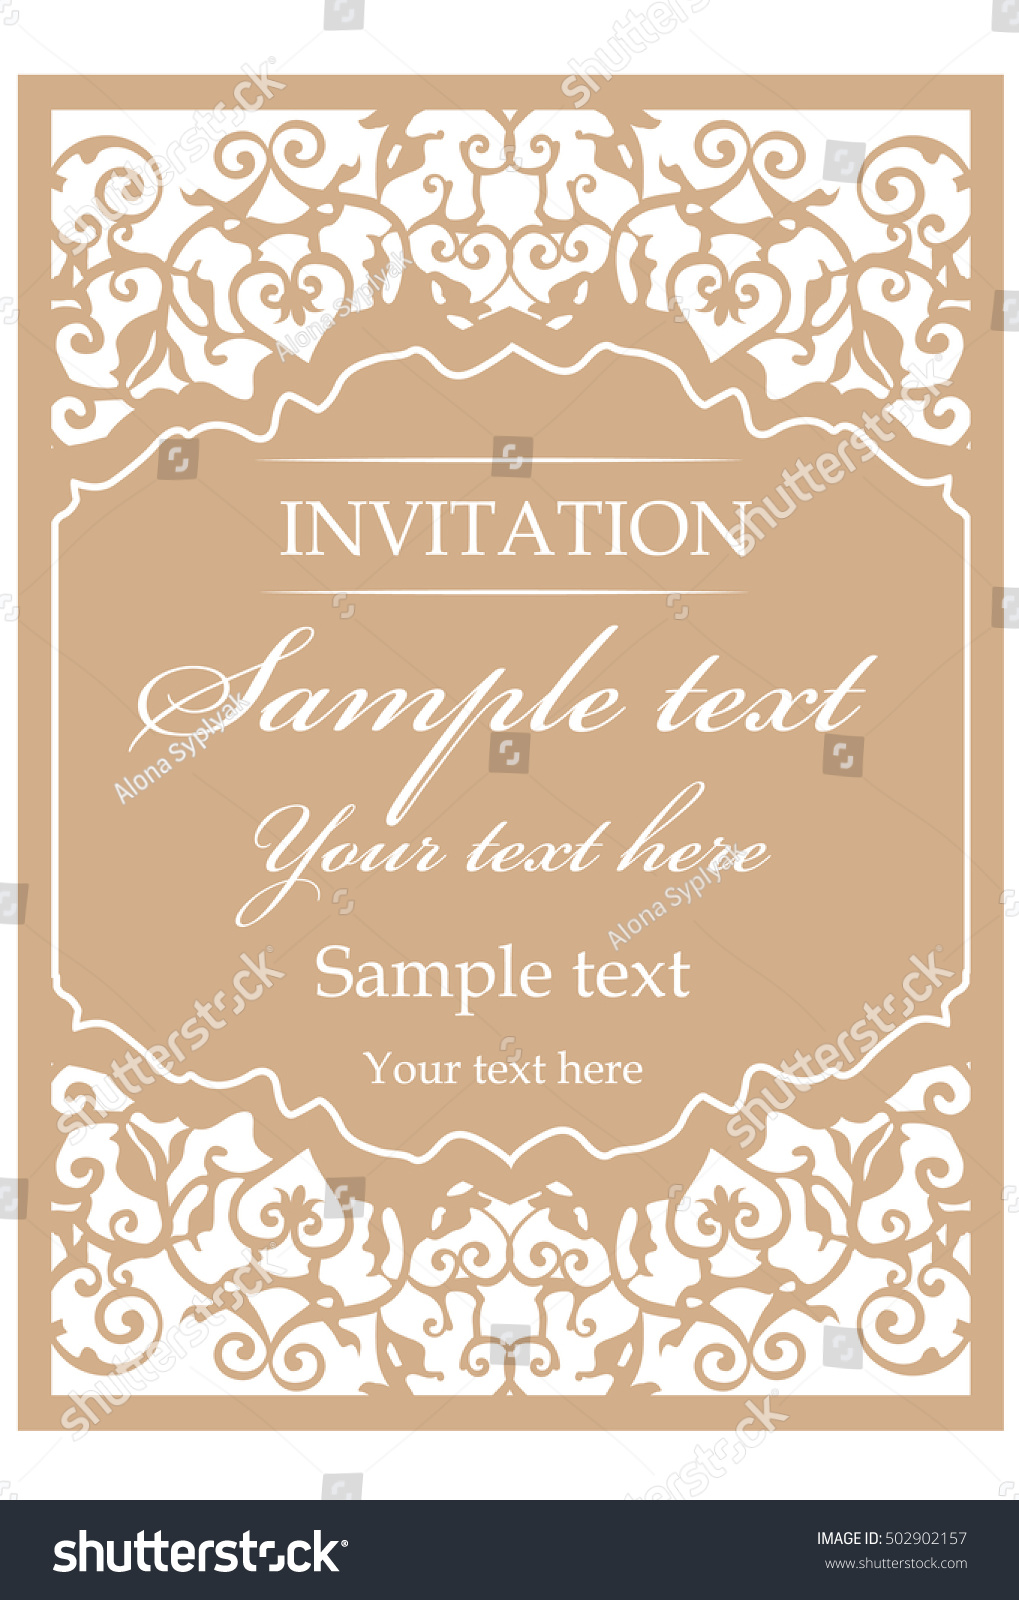 Ornamental vintage frame wedding invitations invitation stock ornamental vintage frame for wedding invitations invitation cards in an vintage style ornate stopboris Gallery